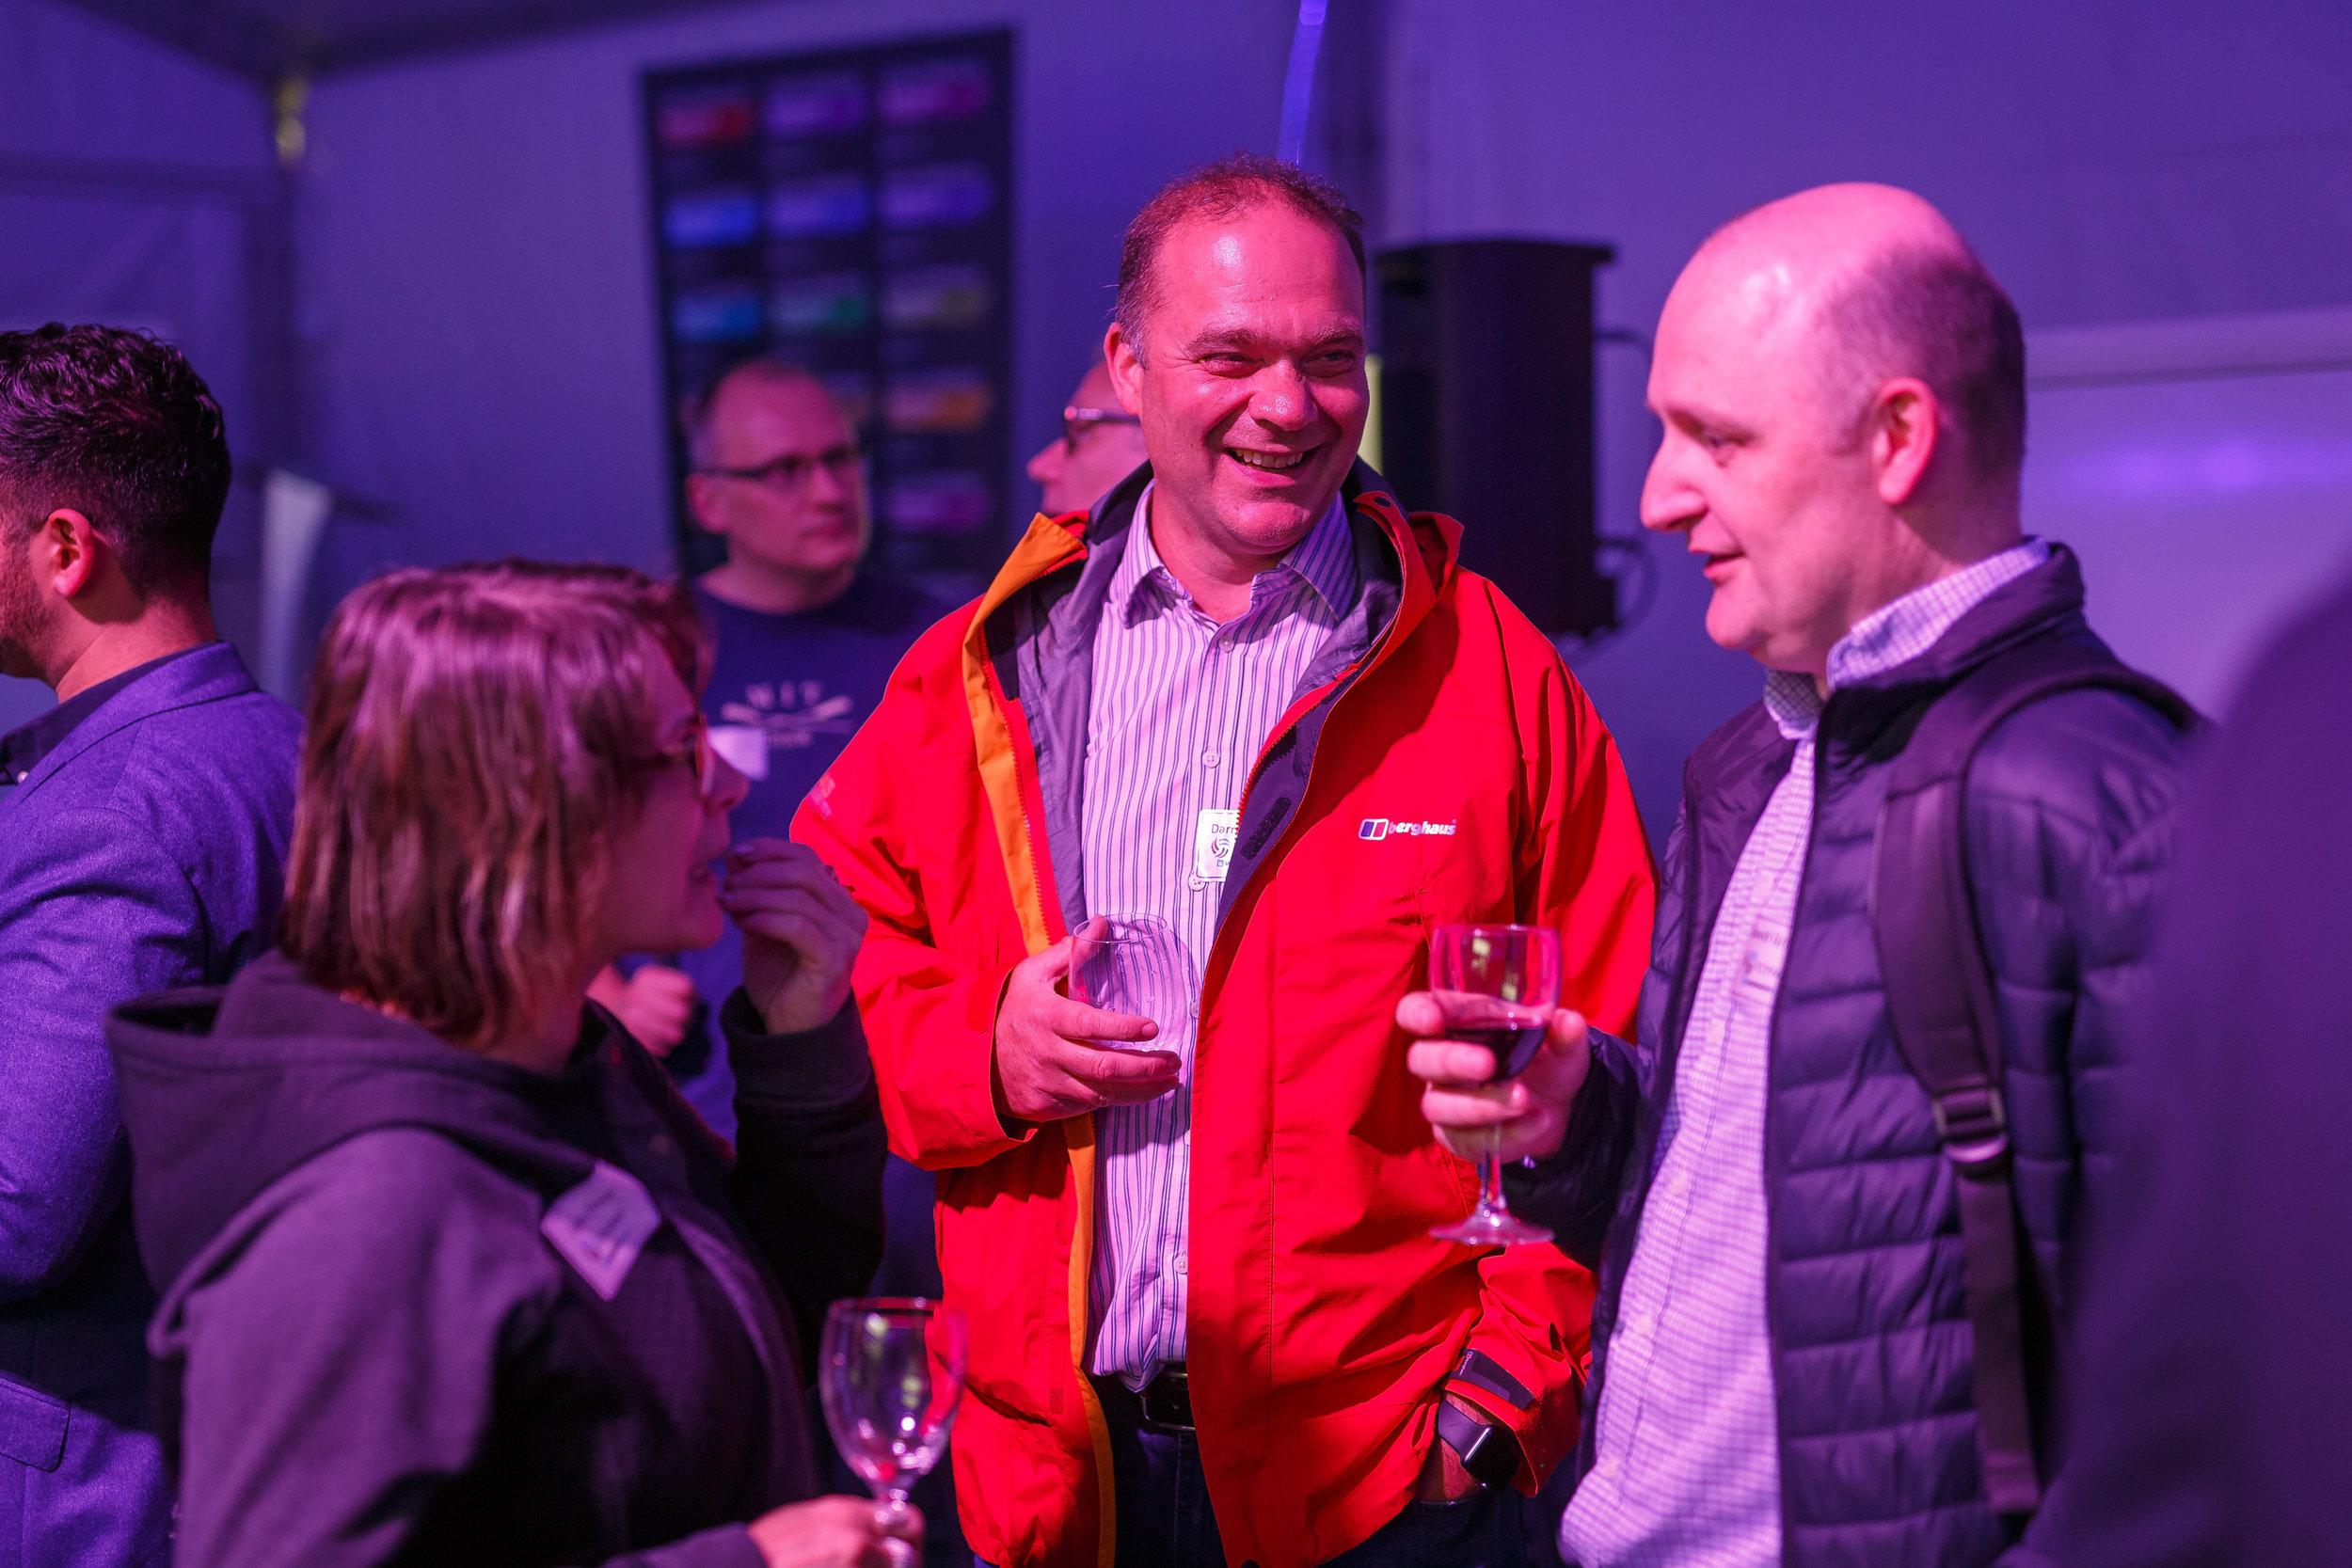 2018.06.08-CyNam-Cheltenham-Science-Festival-iPlus-0009.jpg